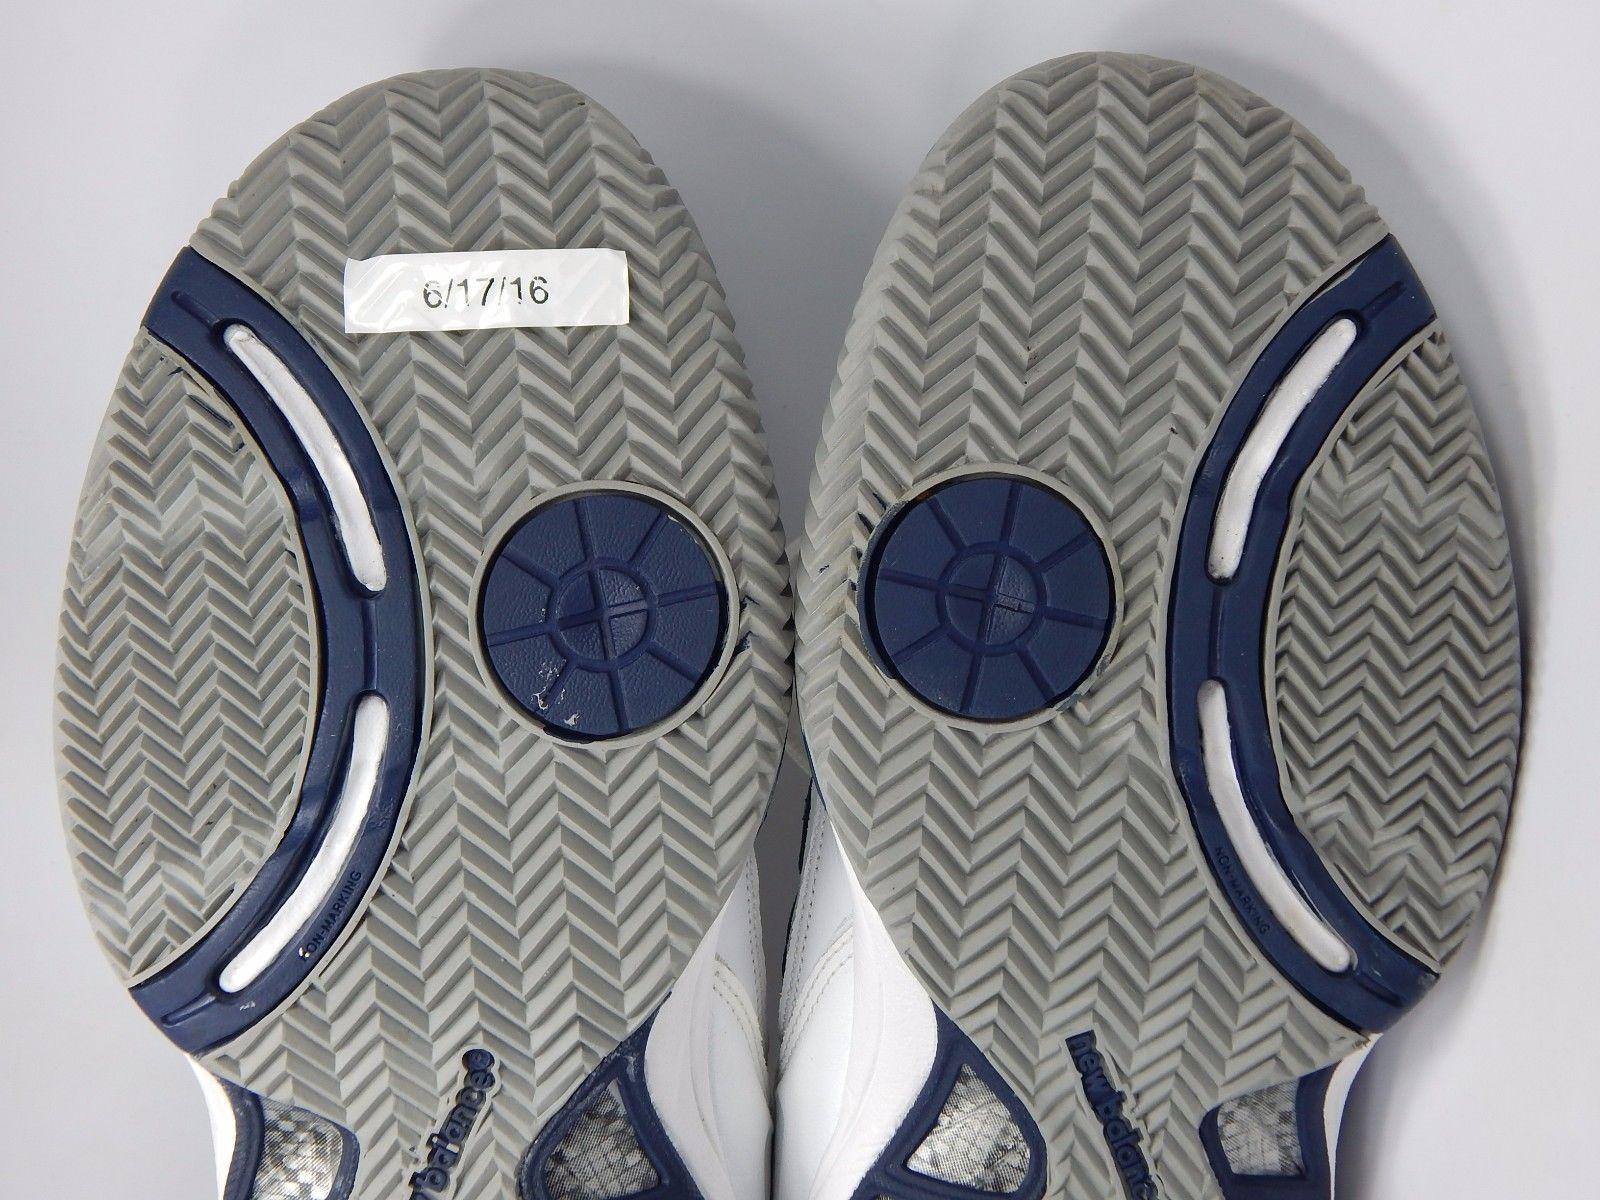 New Balance 806 Men's Tennis Court Shoes Size 8.5 4E EXTRA WIDE EU 42 MC806W